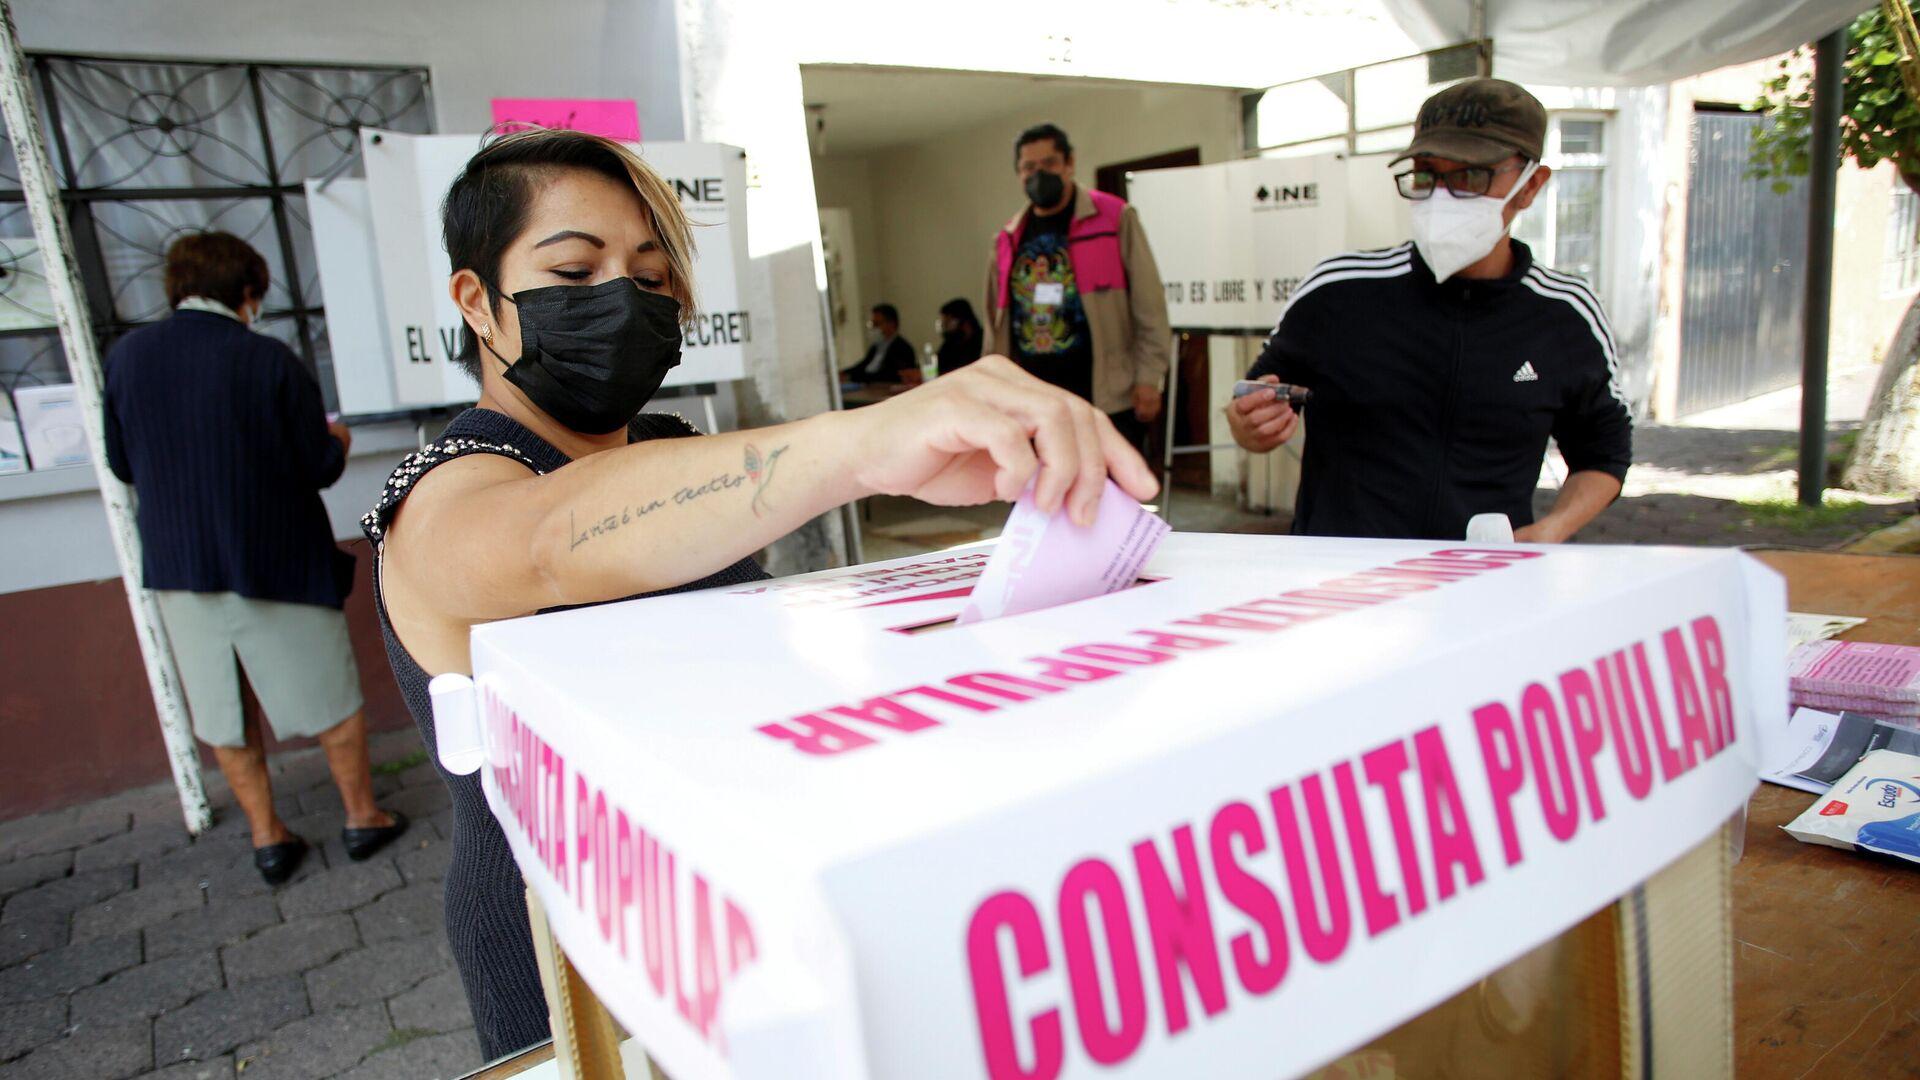 La primera consulta popular celebrada en México, el 1 de agosto de 2021 - Sputnik Mundo, 1920, 02.08.2021